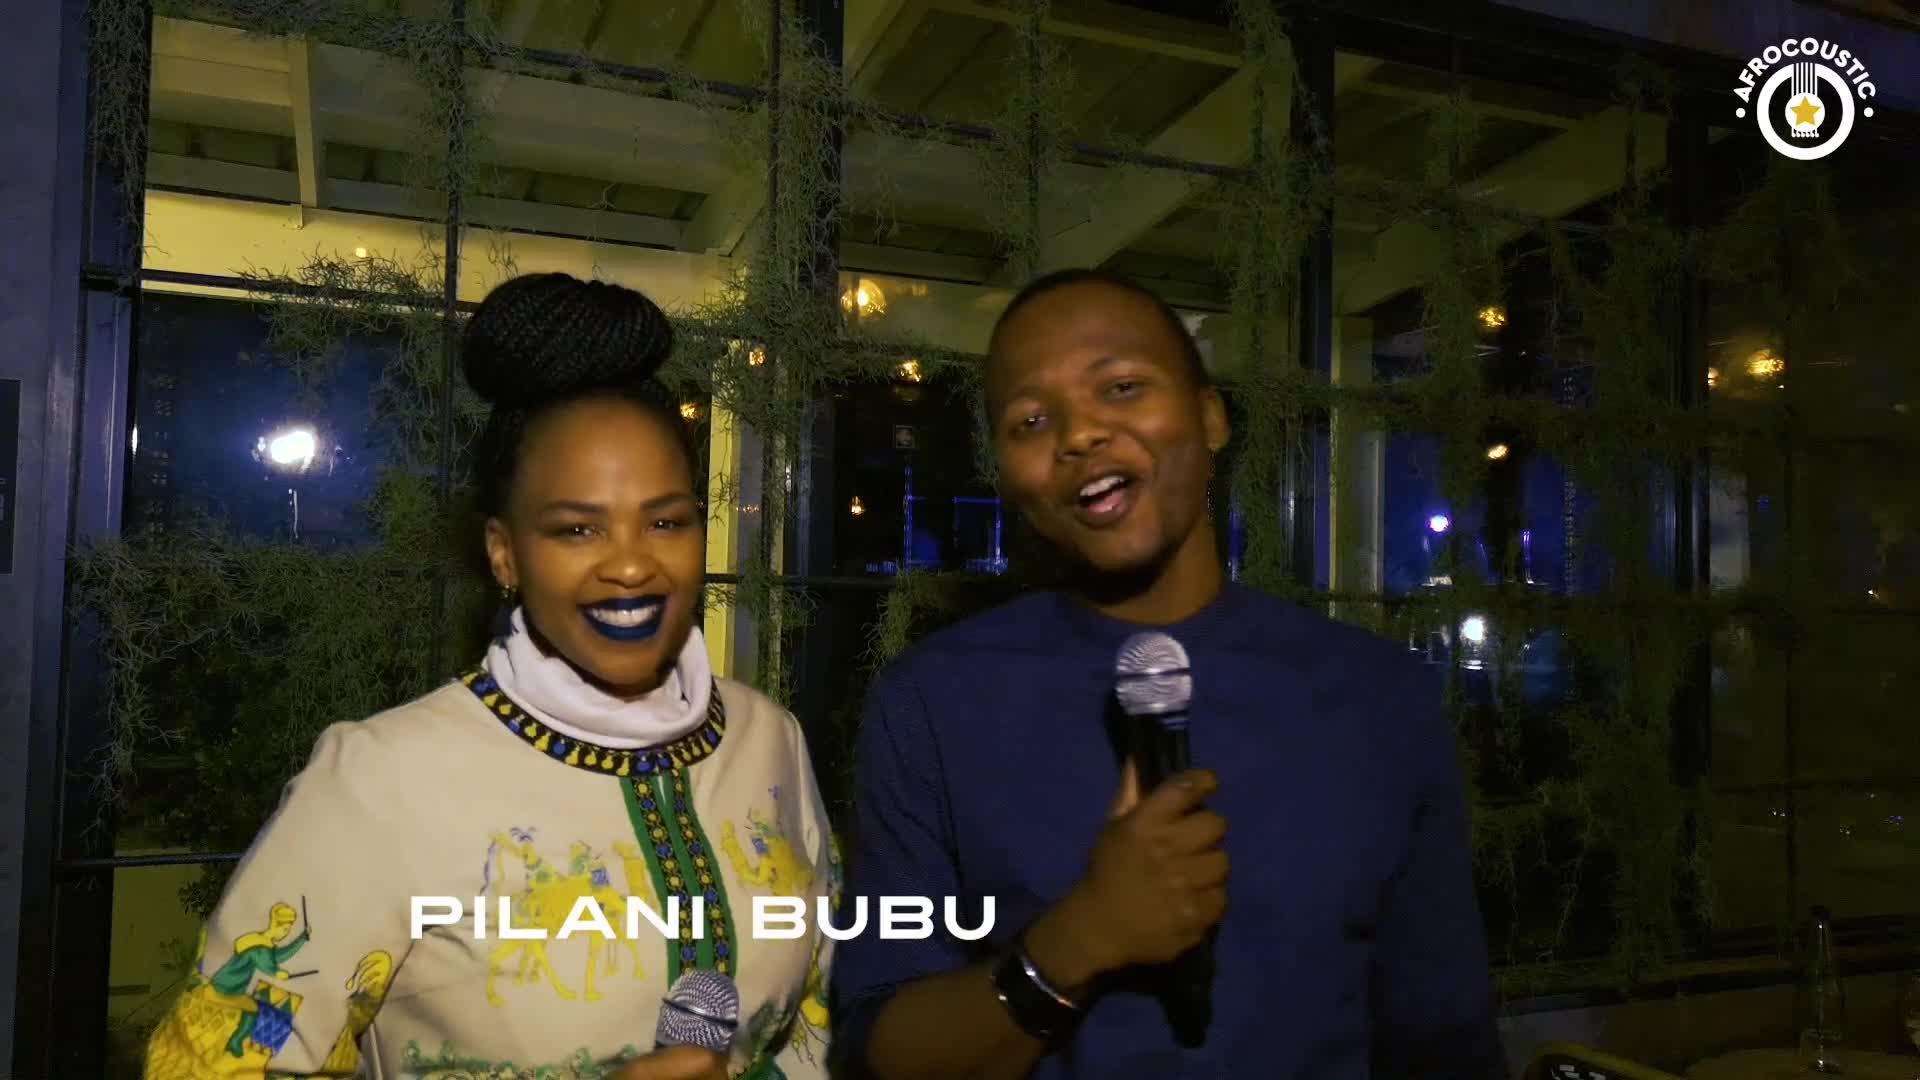 Afrocoustic - Pilani Bubu - Interview